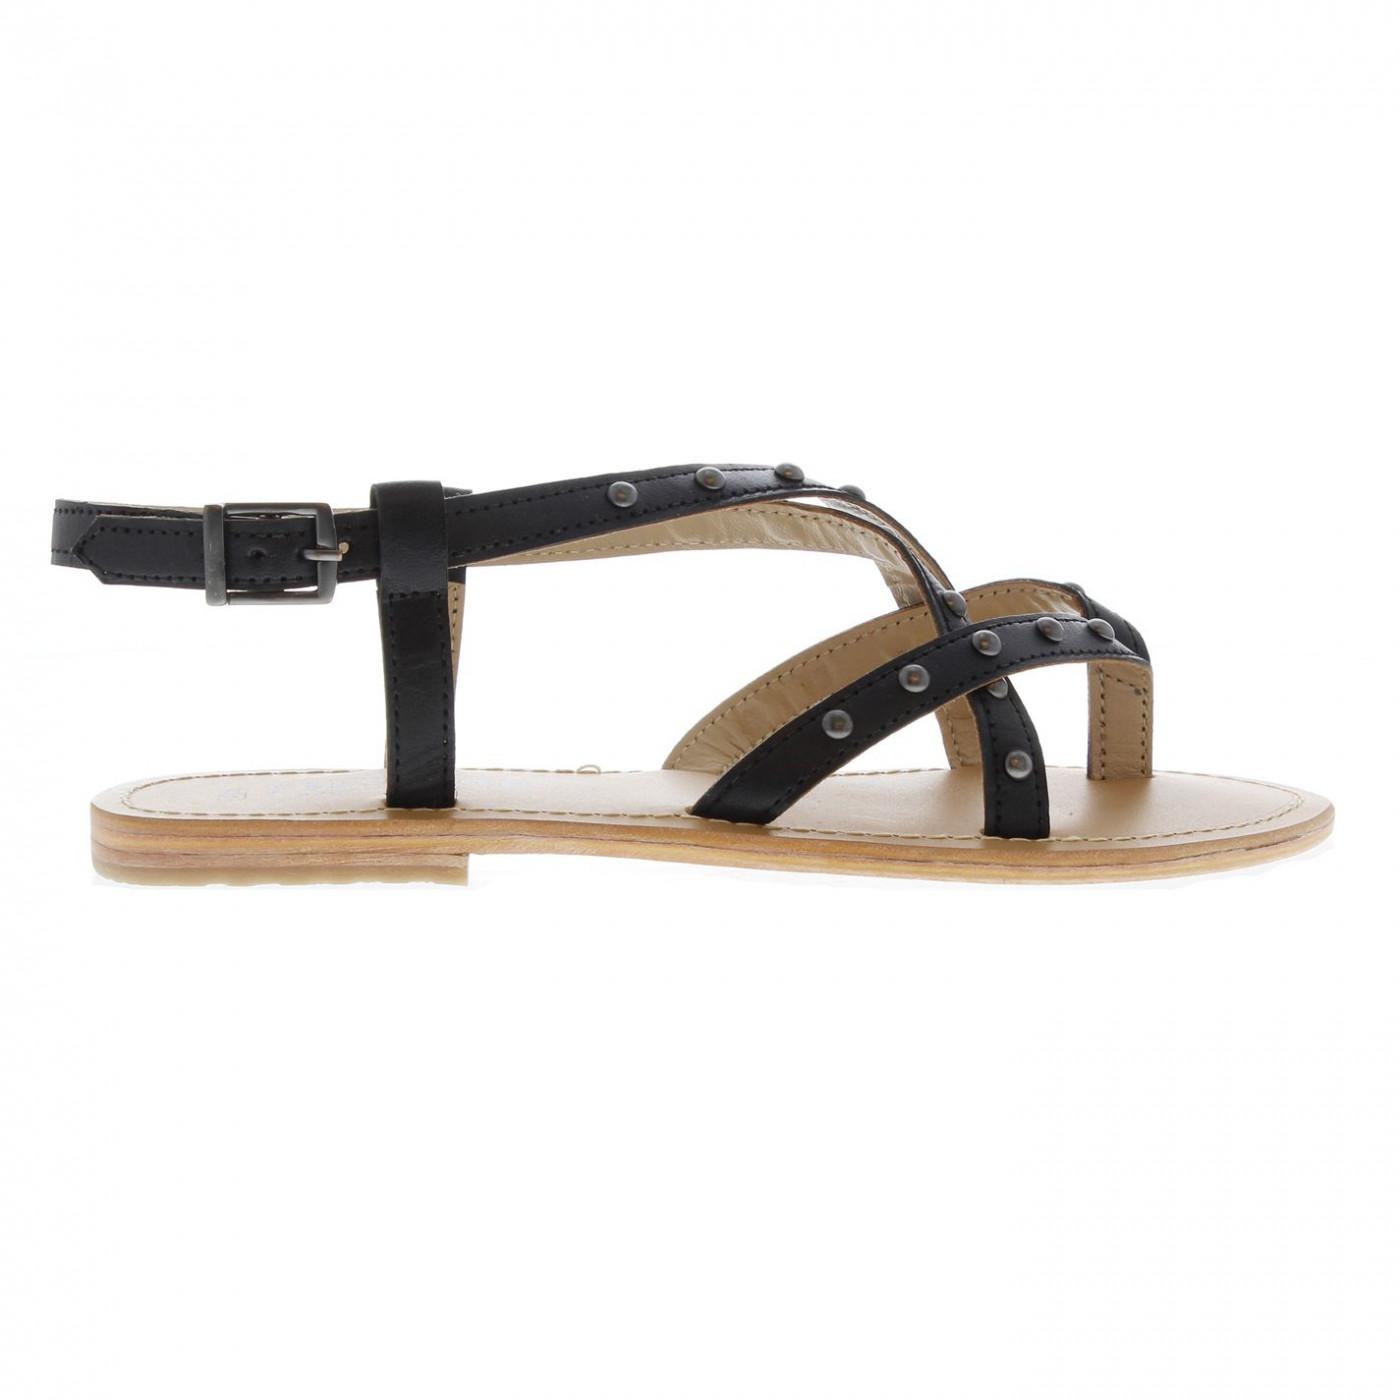 Firetrap Blackseal Dalhia Gladiator Sandals